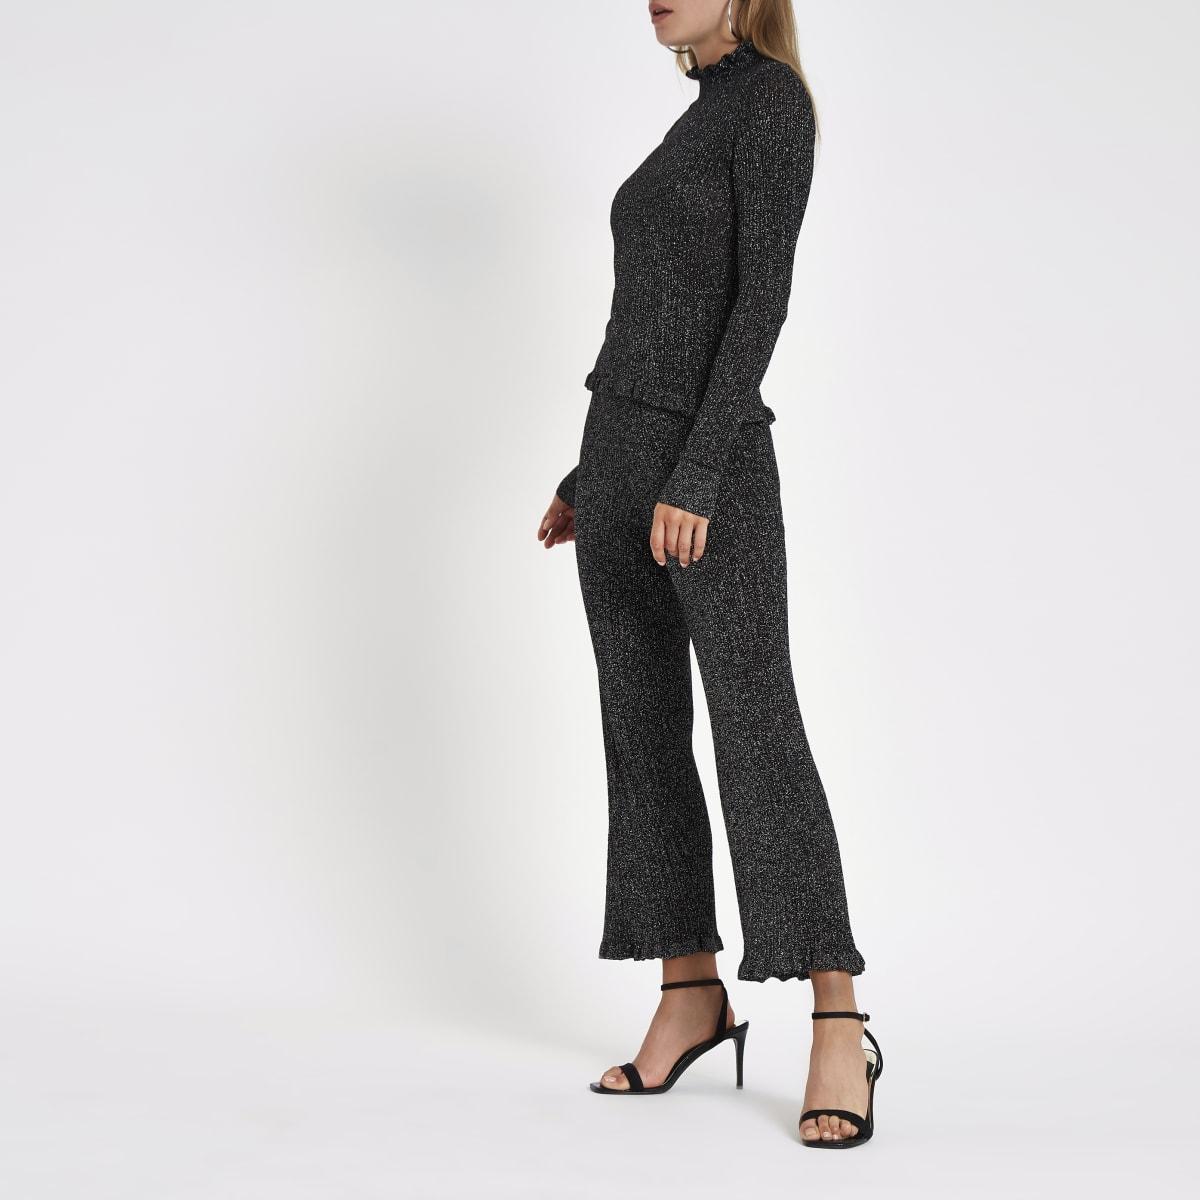 Black metallic knit frill hem pants